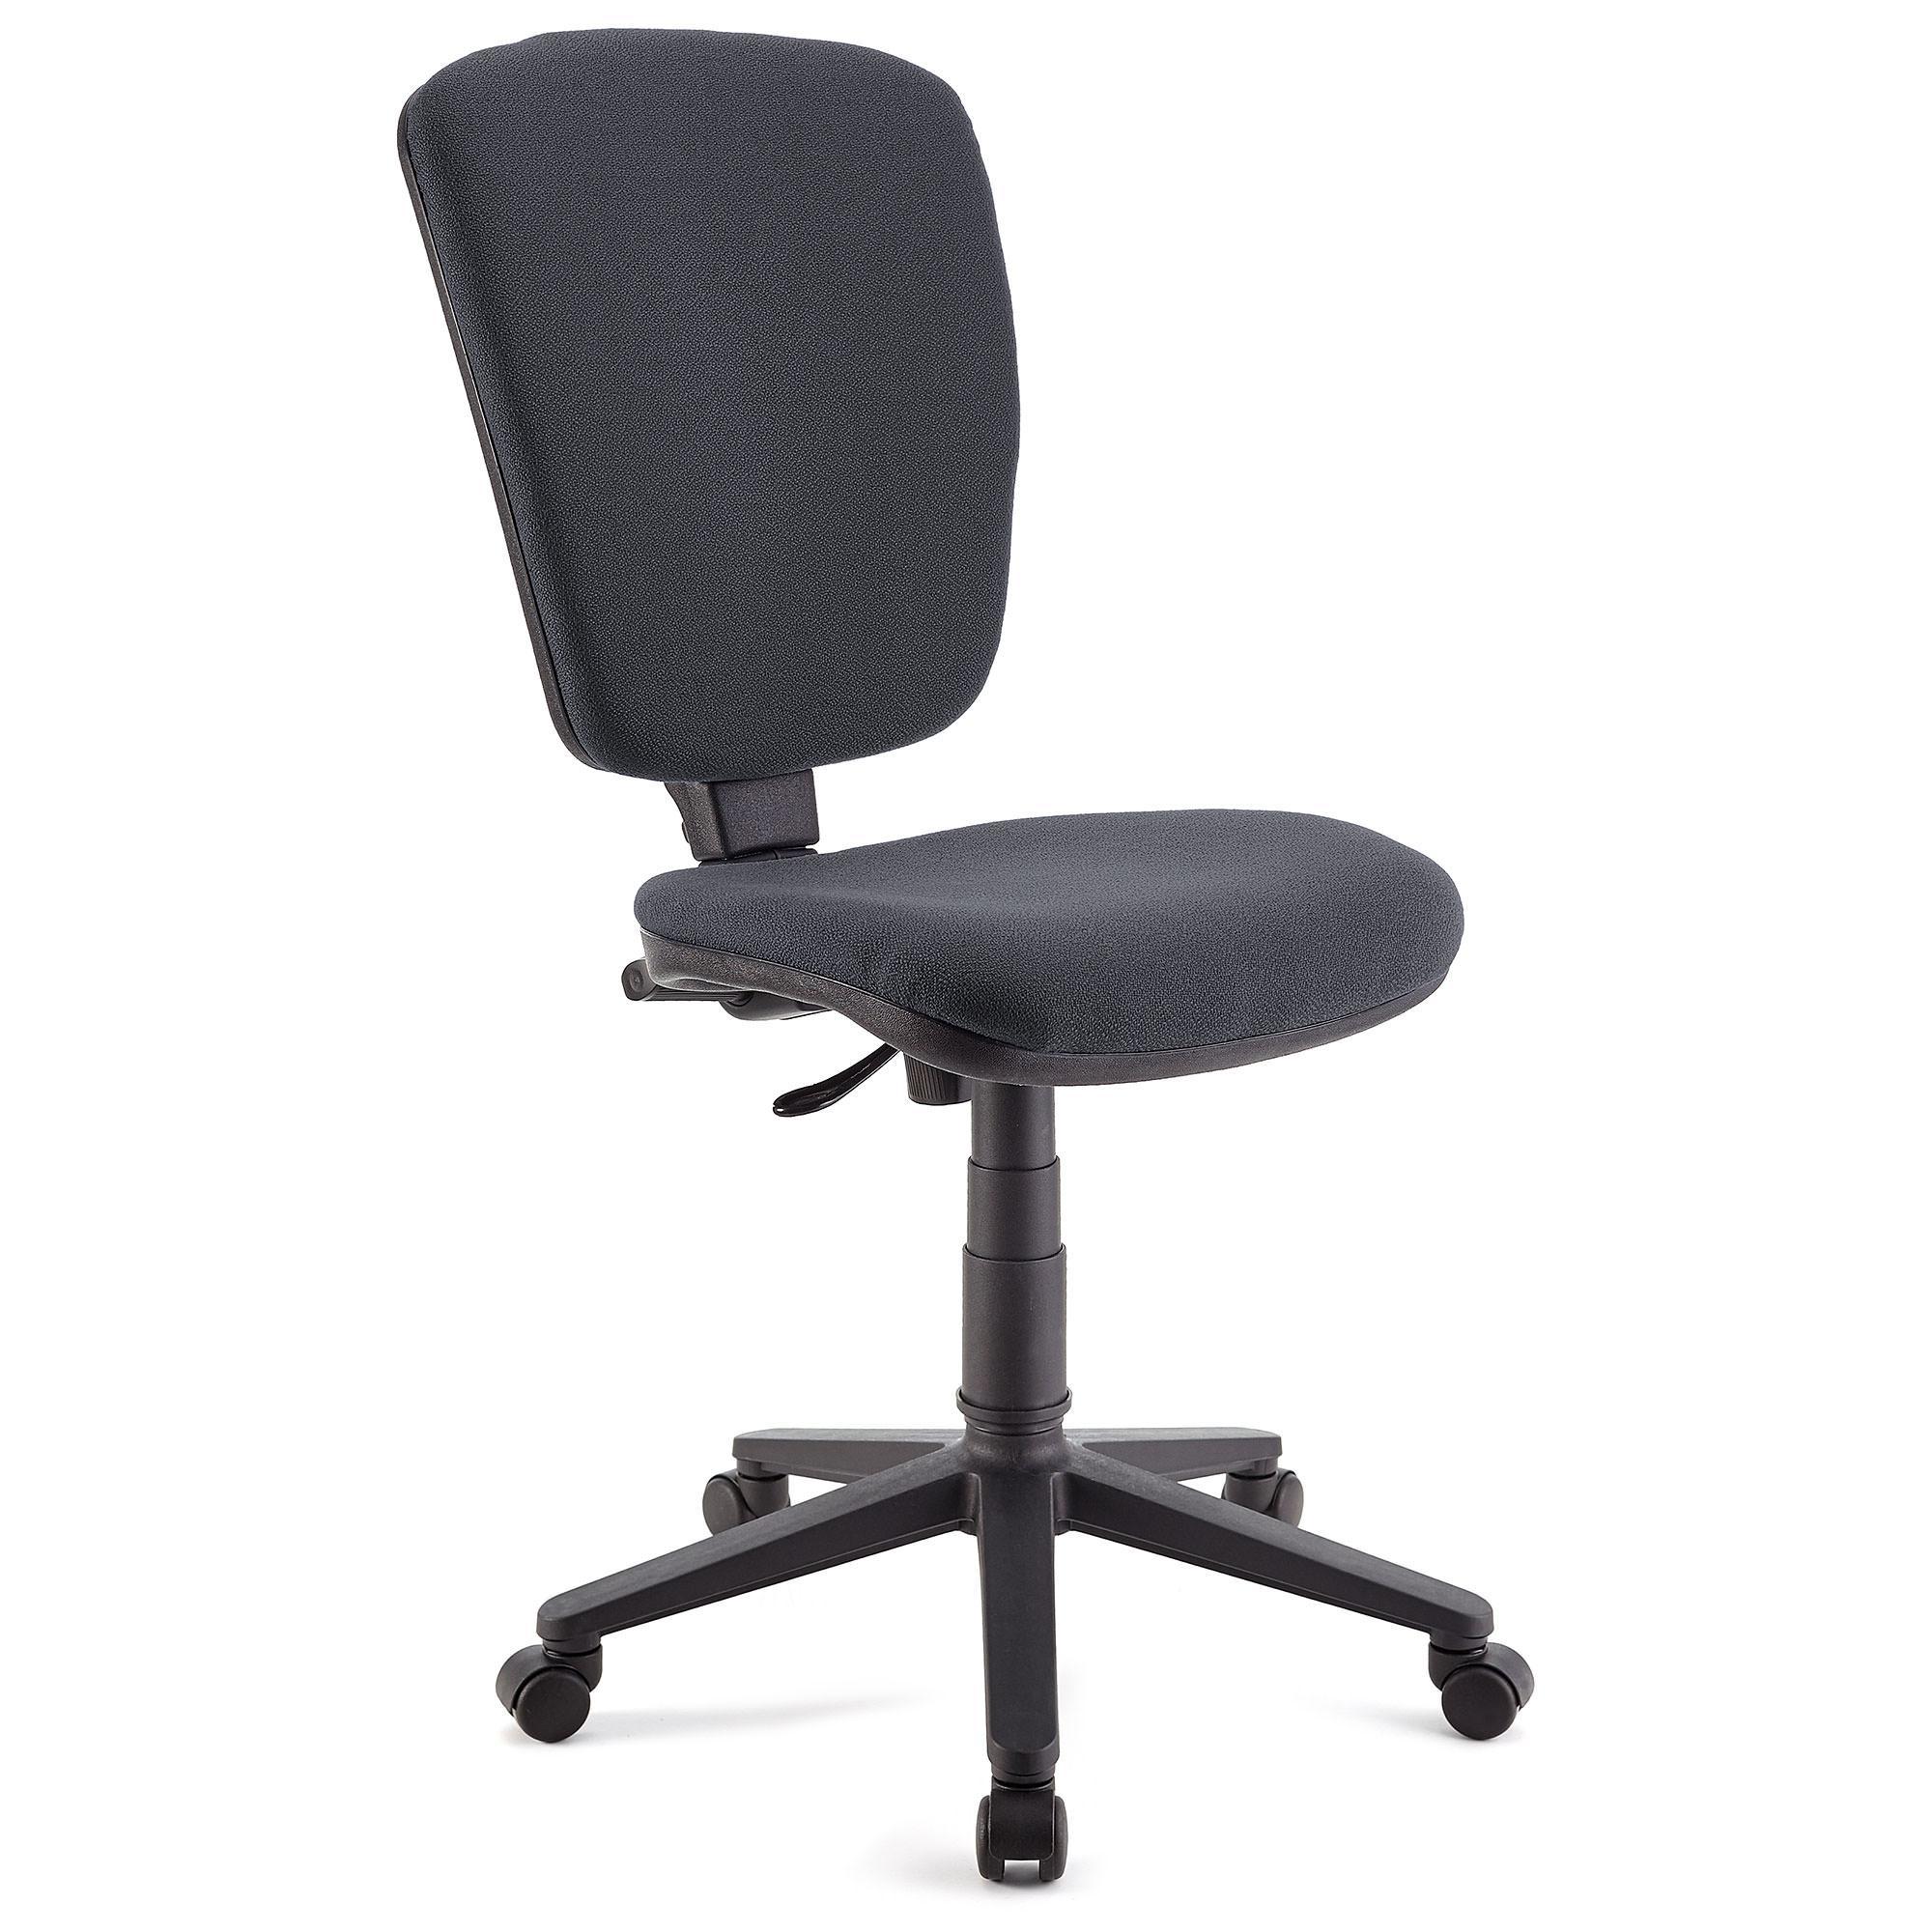 Silla de oficina calipso sin brazos respaldo ajustable for Sillas color gris